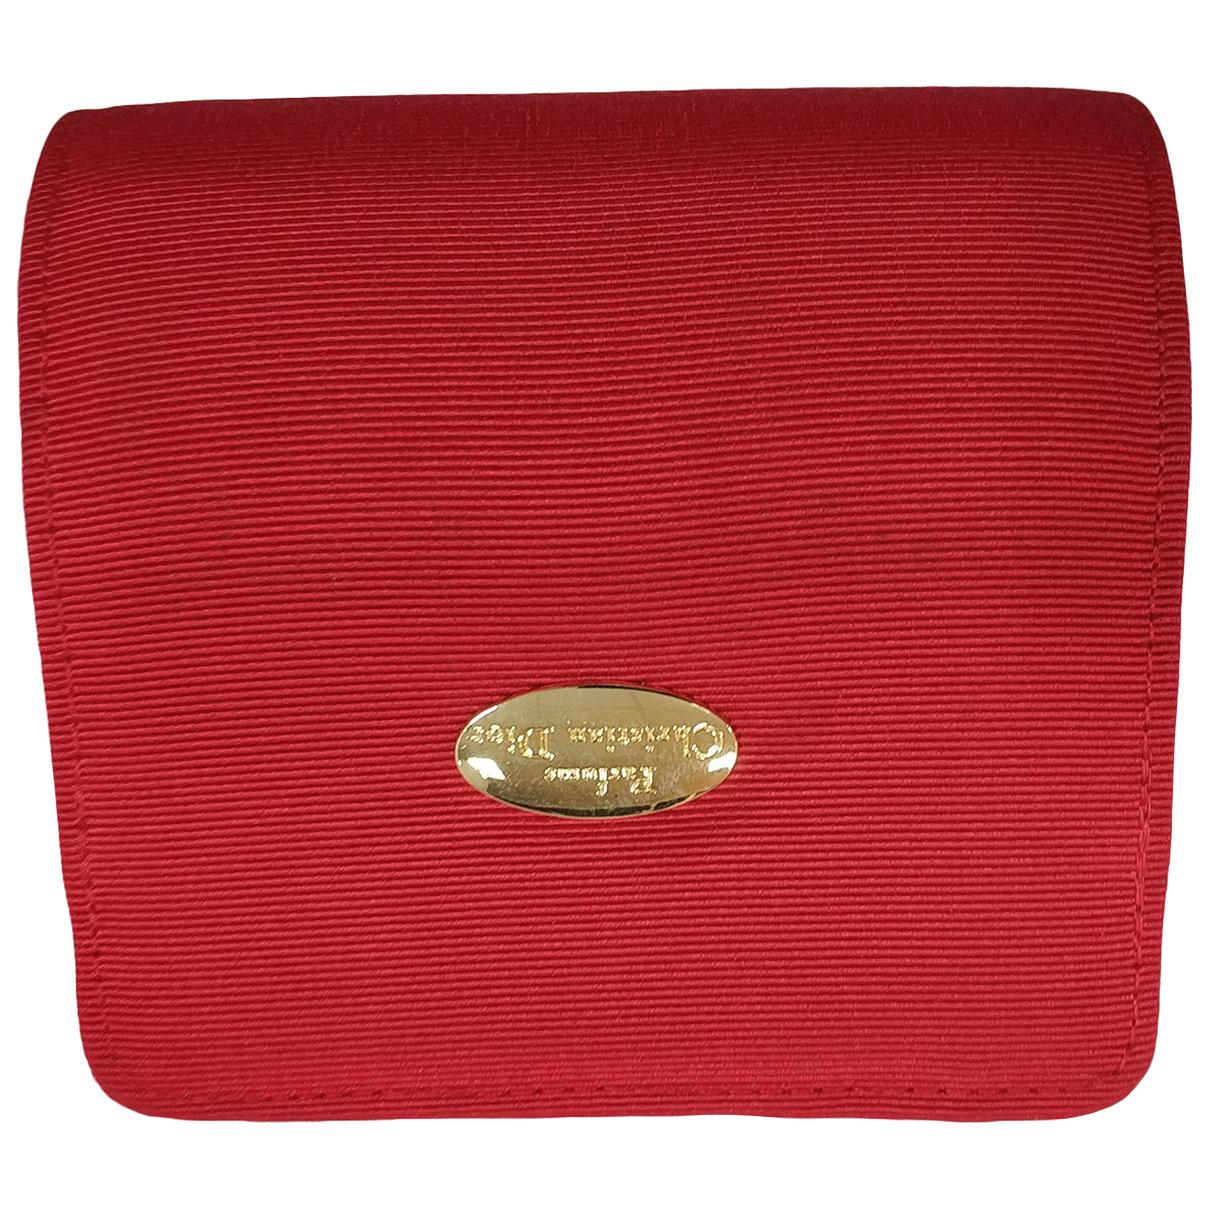 Christian Dior - Petite maroquinerie   pour femme - rouge